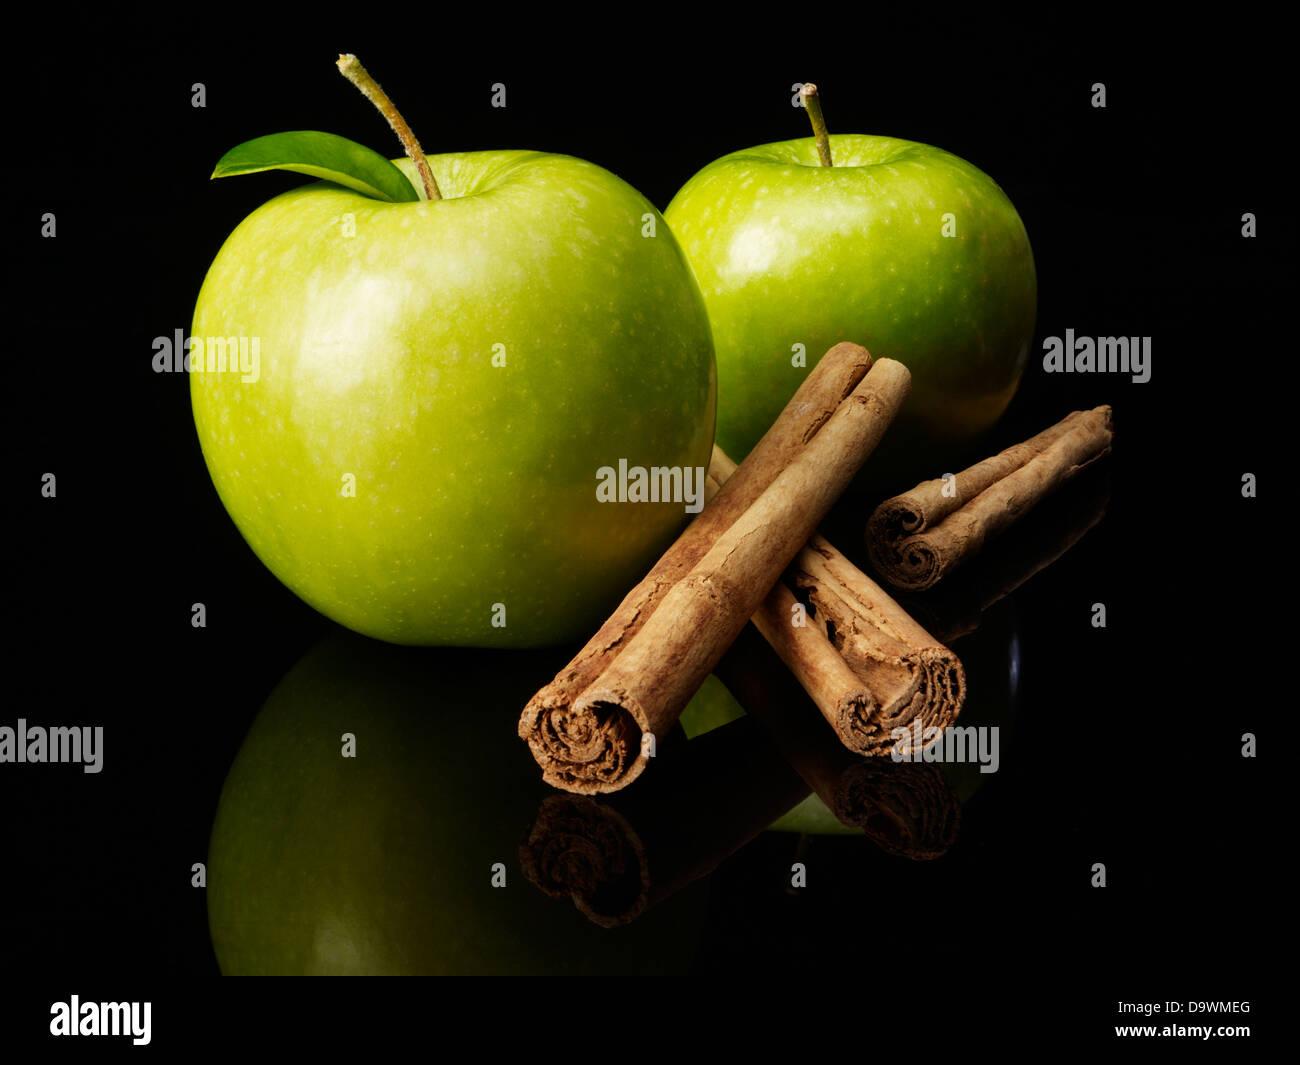 Green Apple Photo Stock